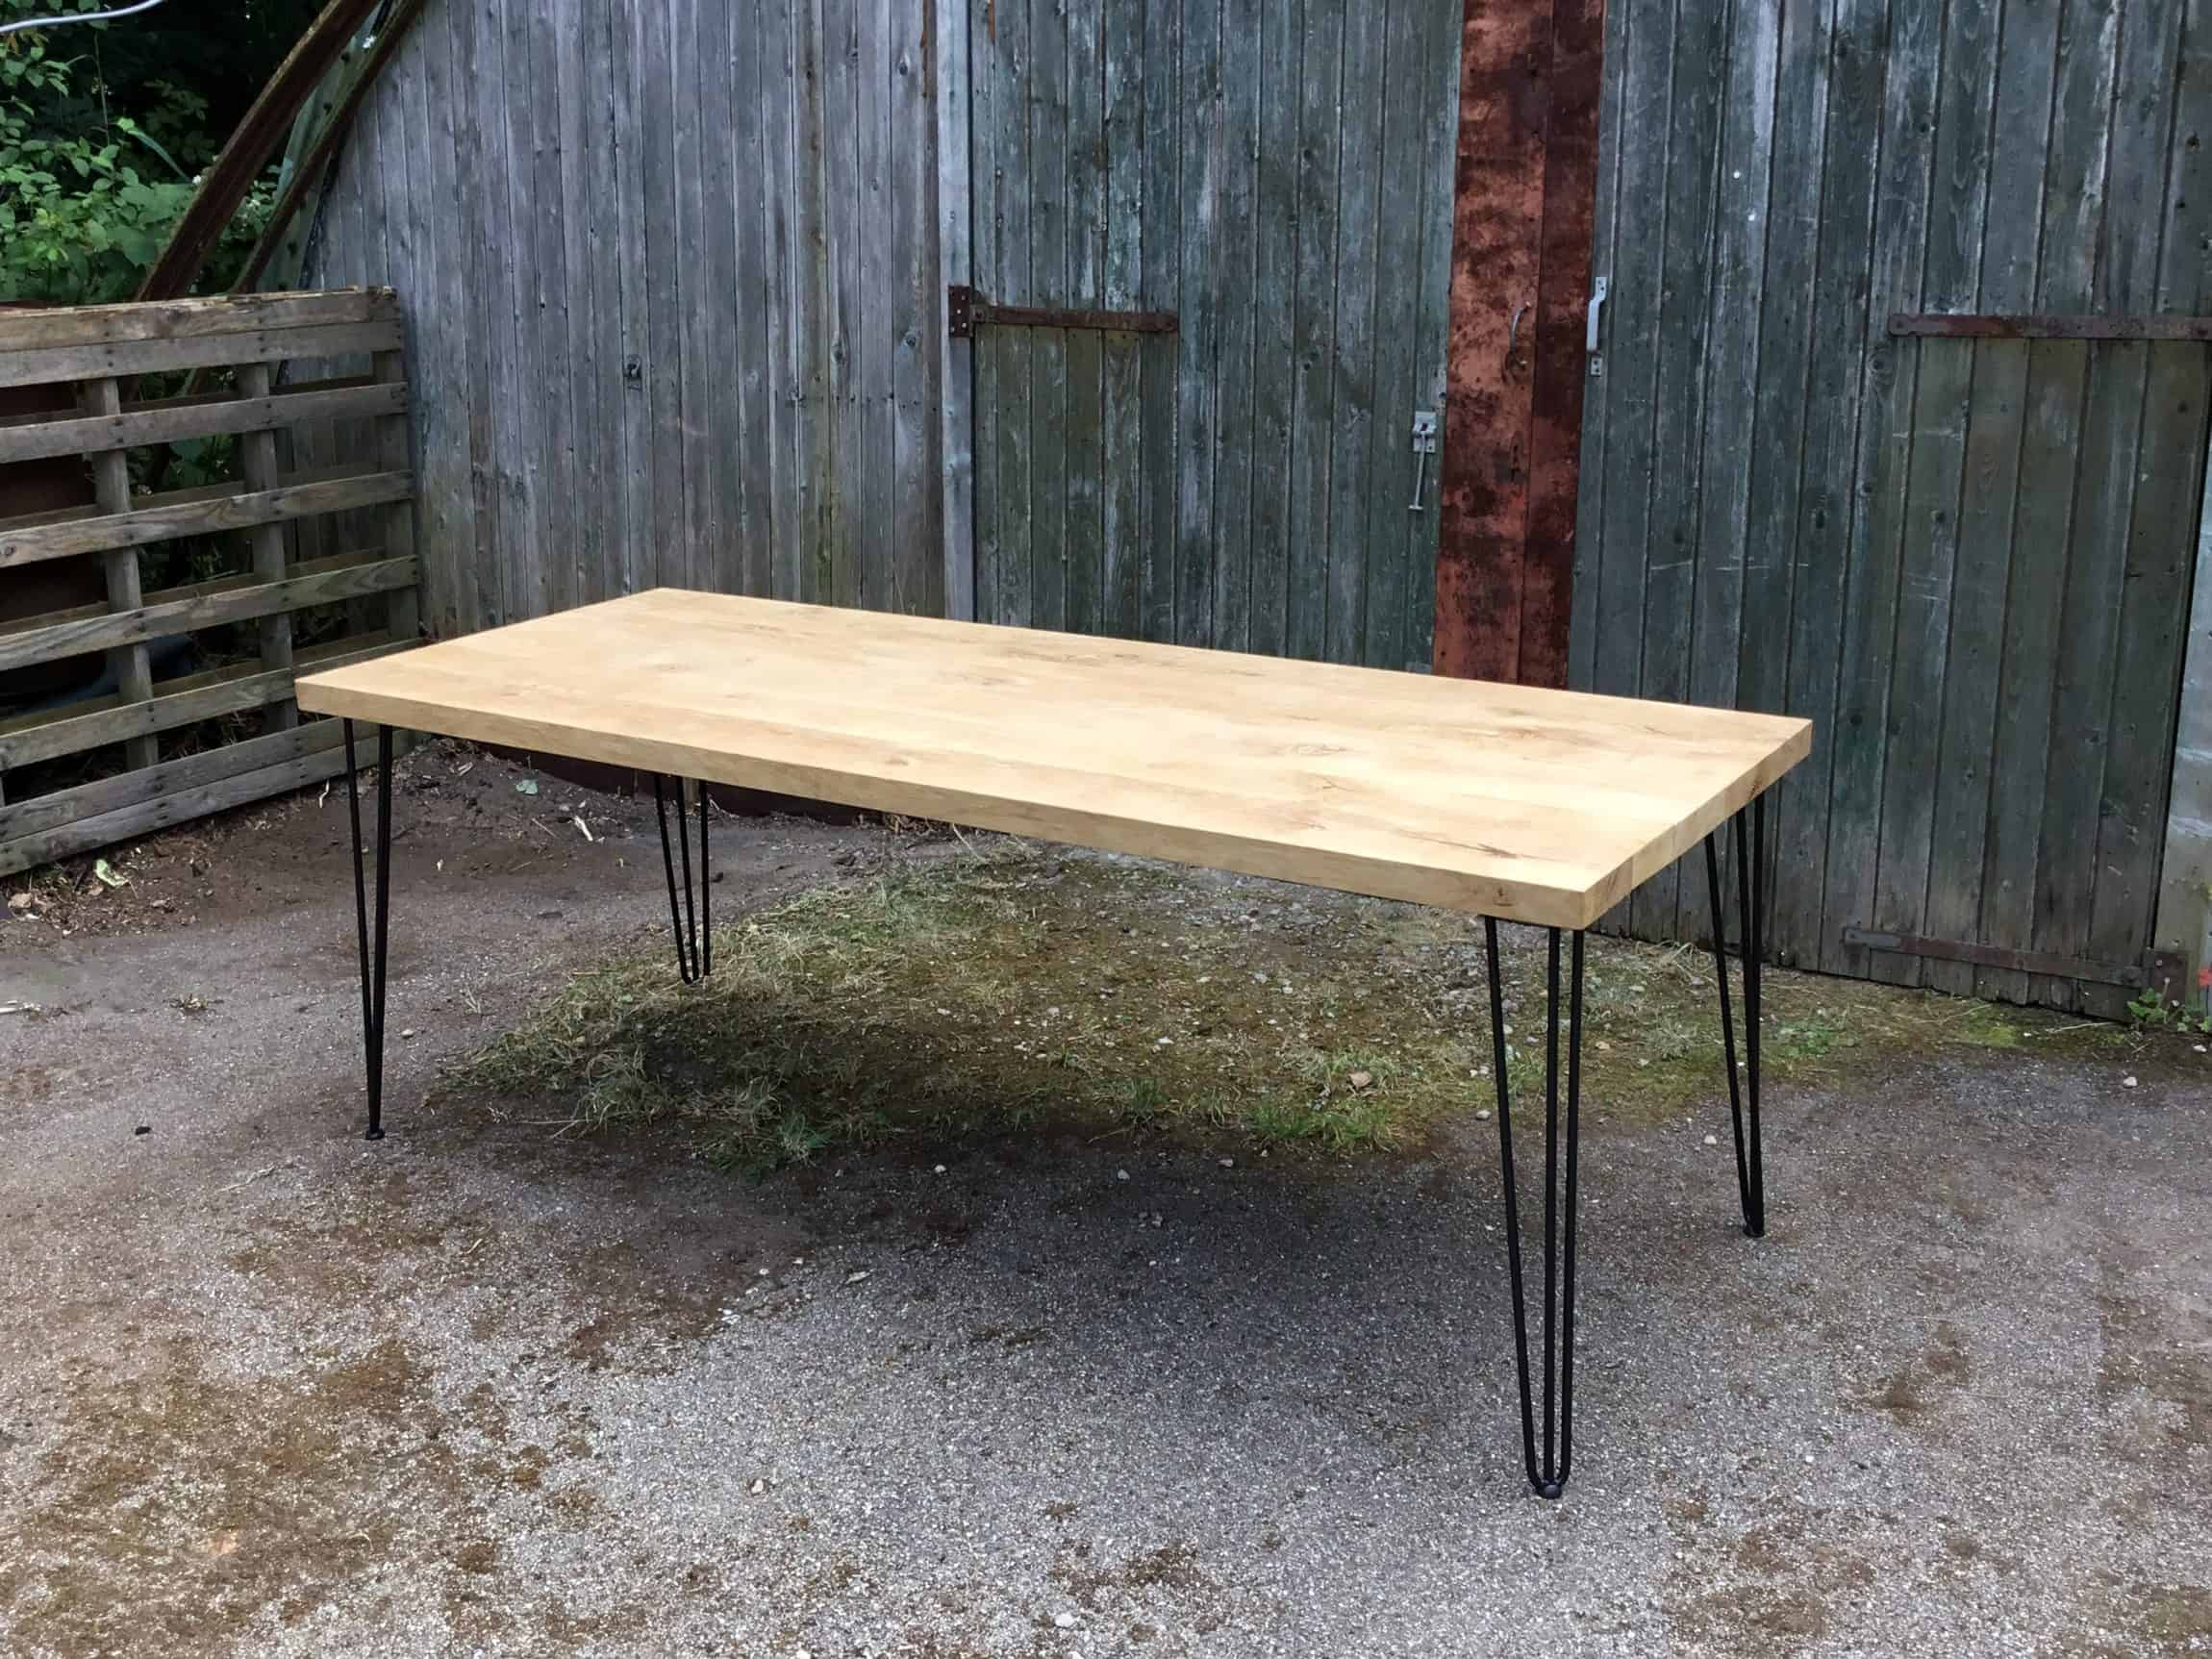 Robuuste Eiken Tafel : Industriële eiken tafels markante tafels